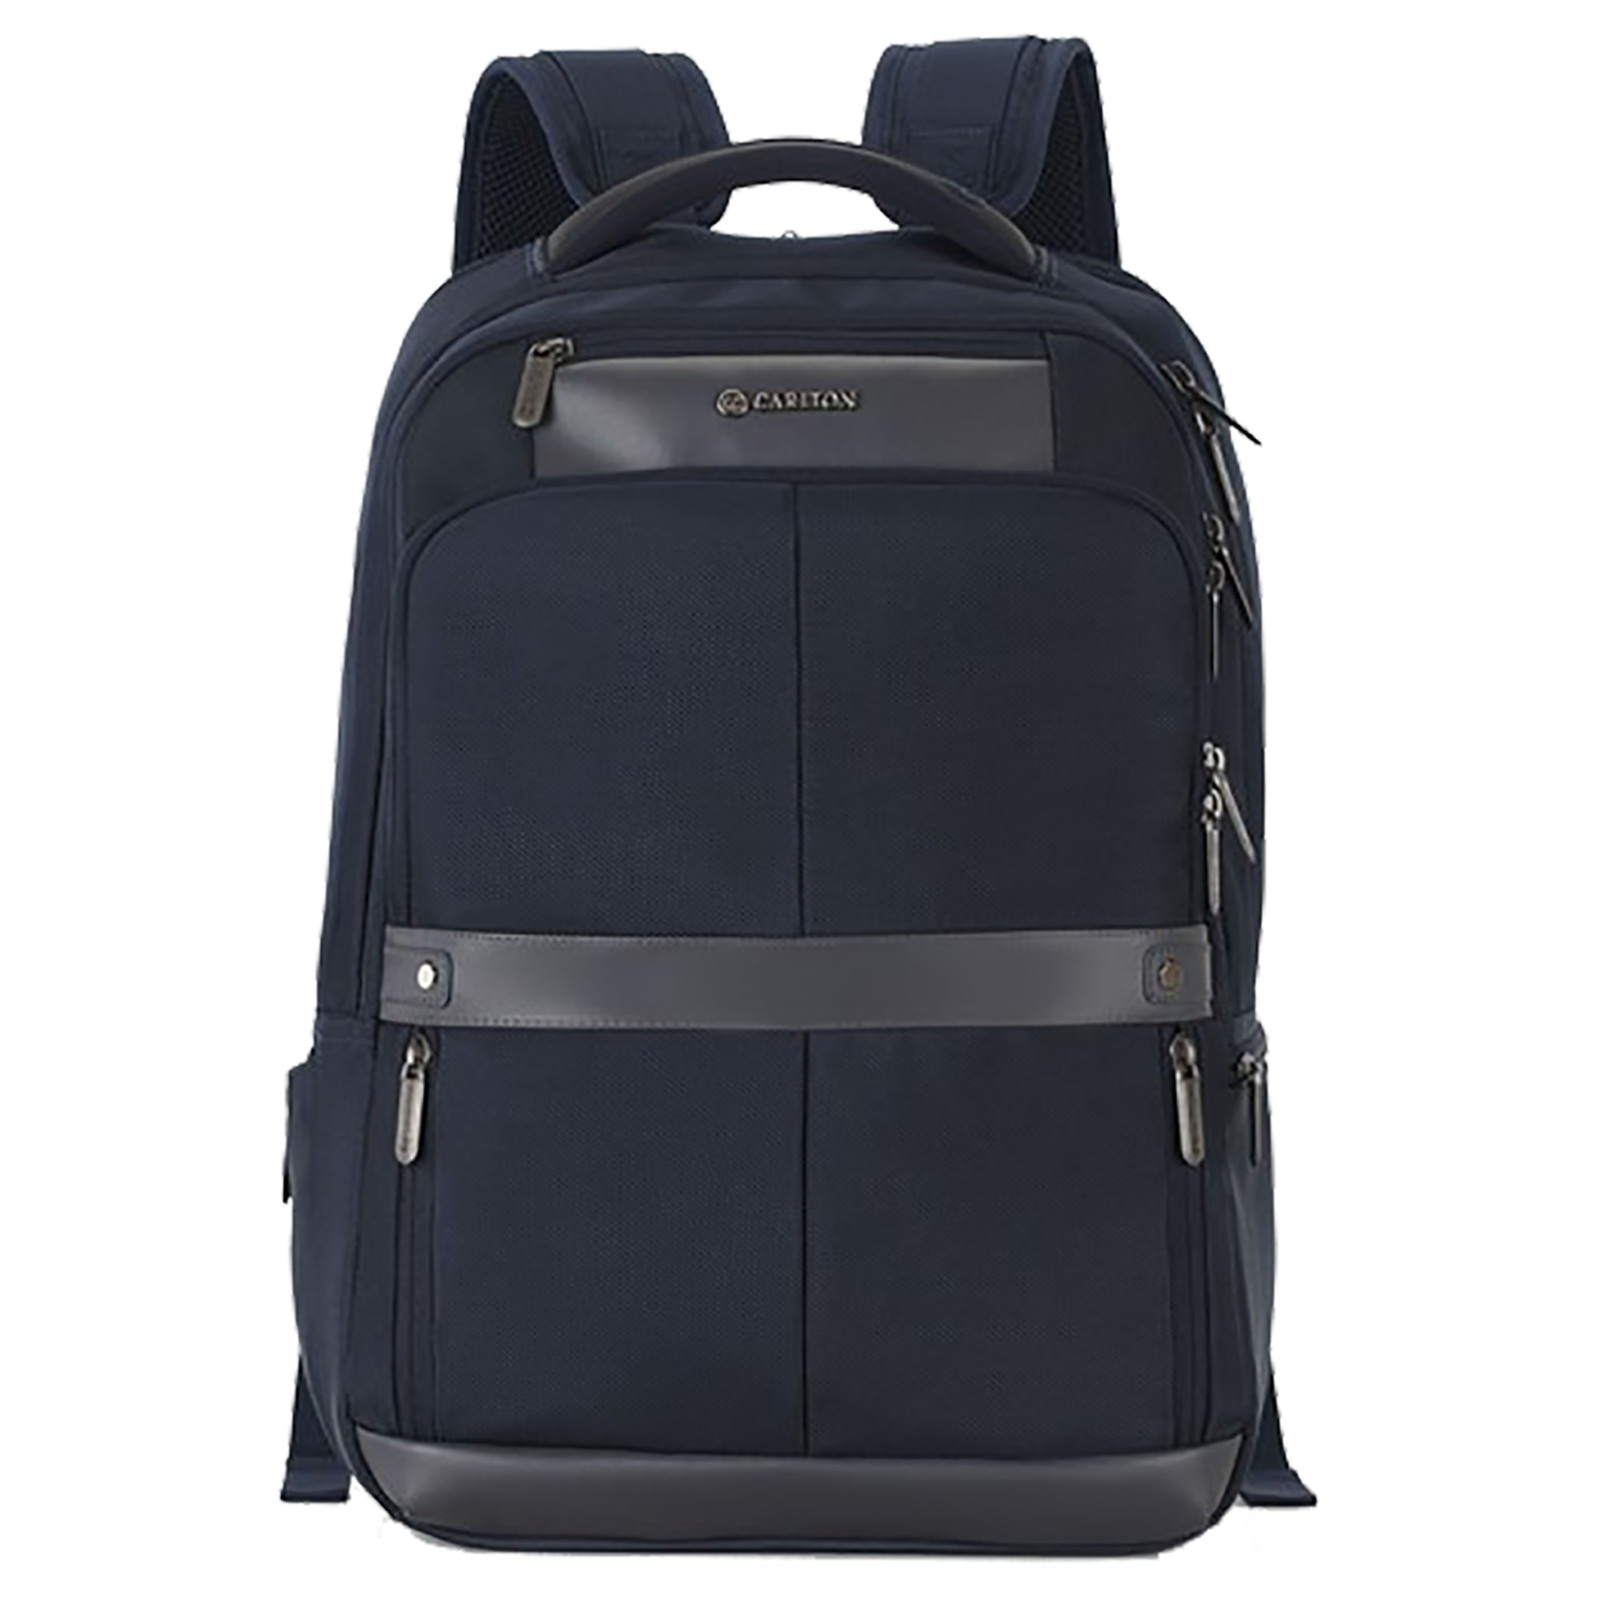 Carlton Hampshire 02 26 Litres 1681 Faux Nylon Backpack for 17 Inch Laptop (Ergofoam Back, BPHAM2BLU, Blue)_1